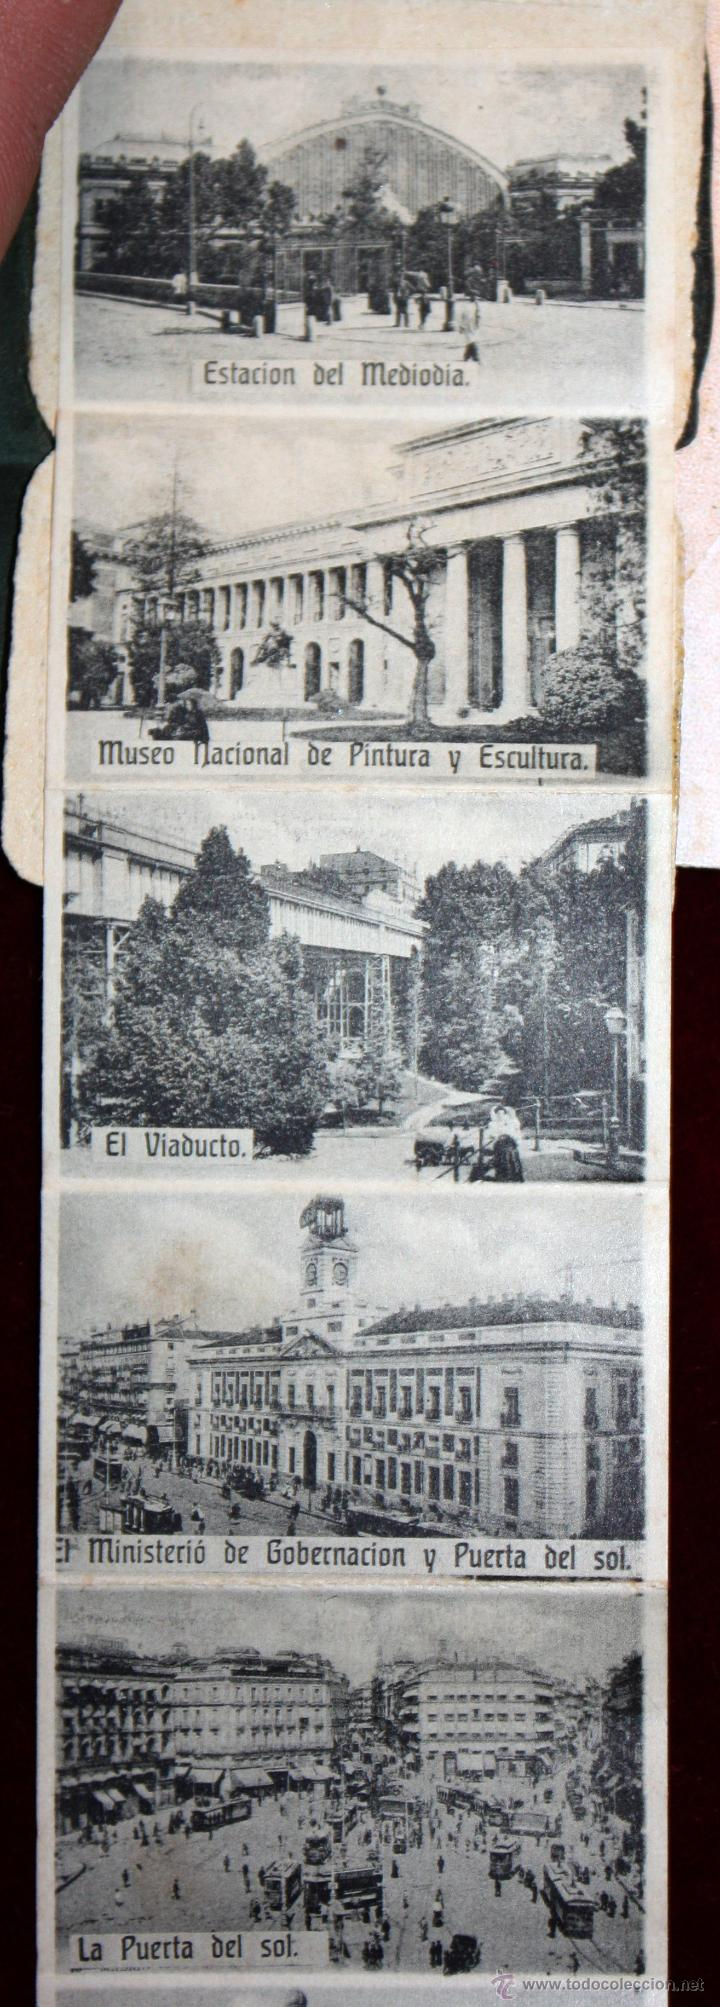 Postales: ANTIGUA POSTAL RECUERDOS DE MADRID. TIRA CON 10 VISTAS. ED. E. DUMAS. CIRCULADA - Foto 3 - 49825270